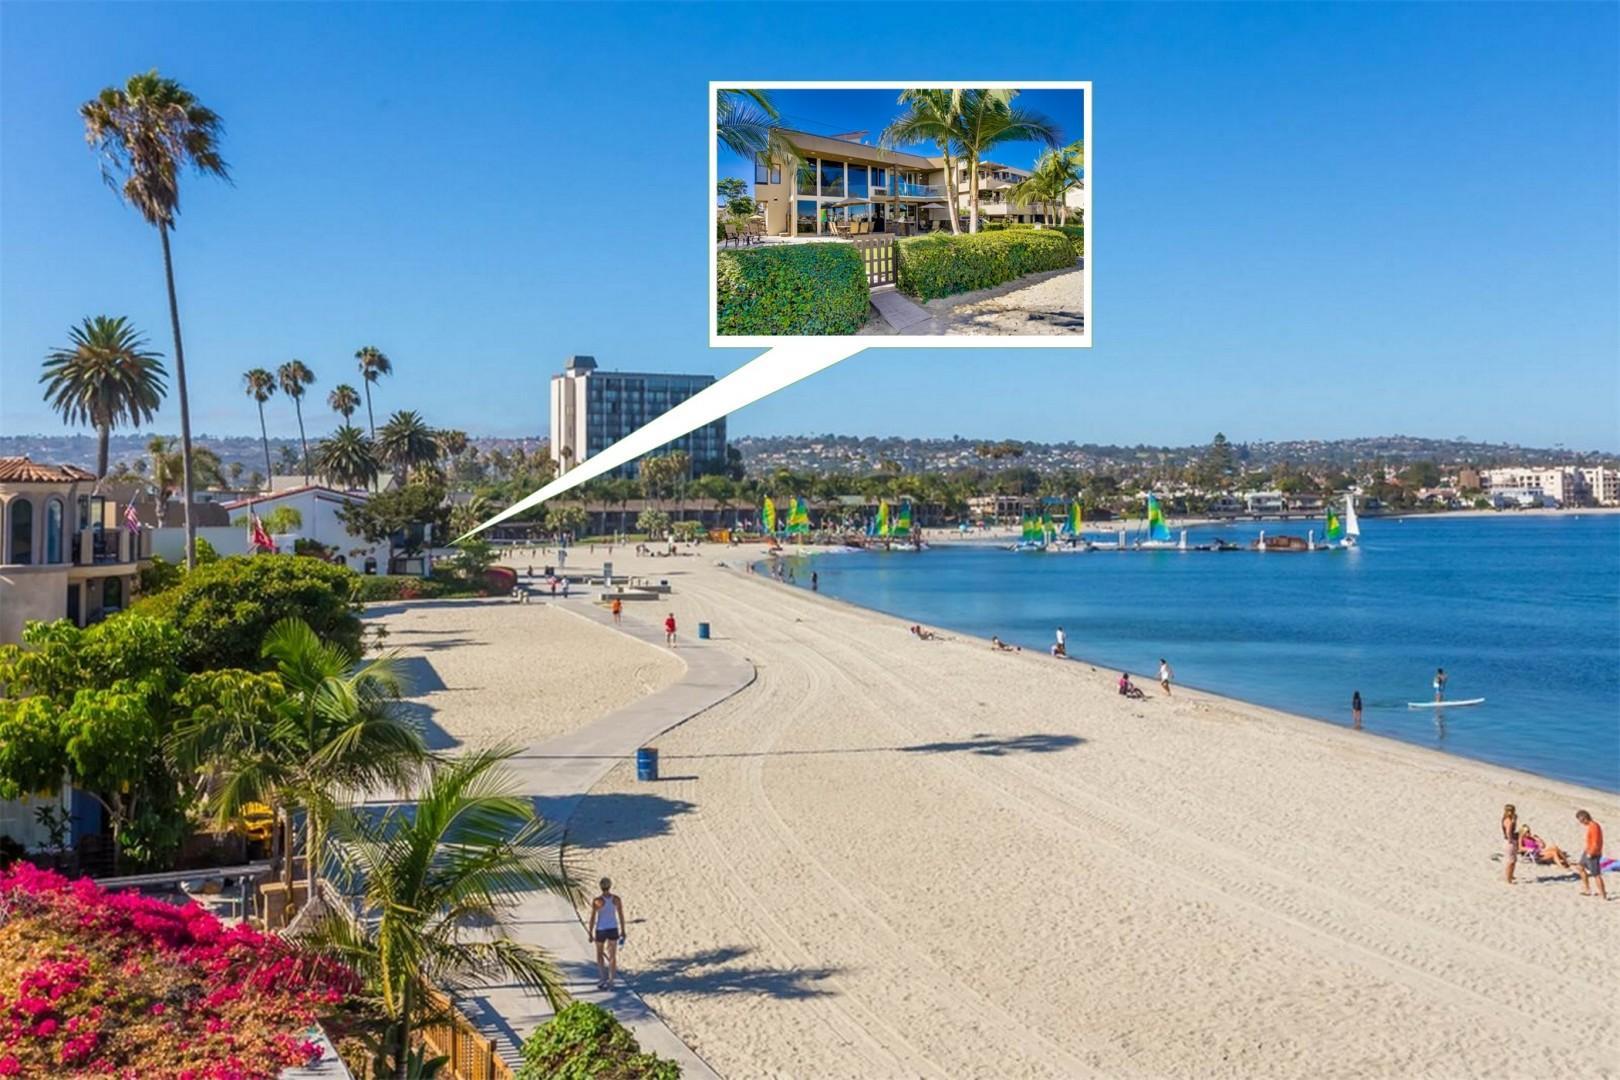 Mission_Beach_Airbnb_Location